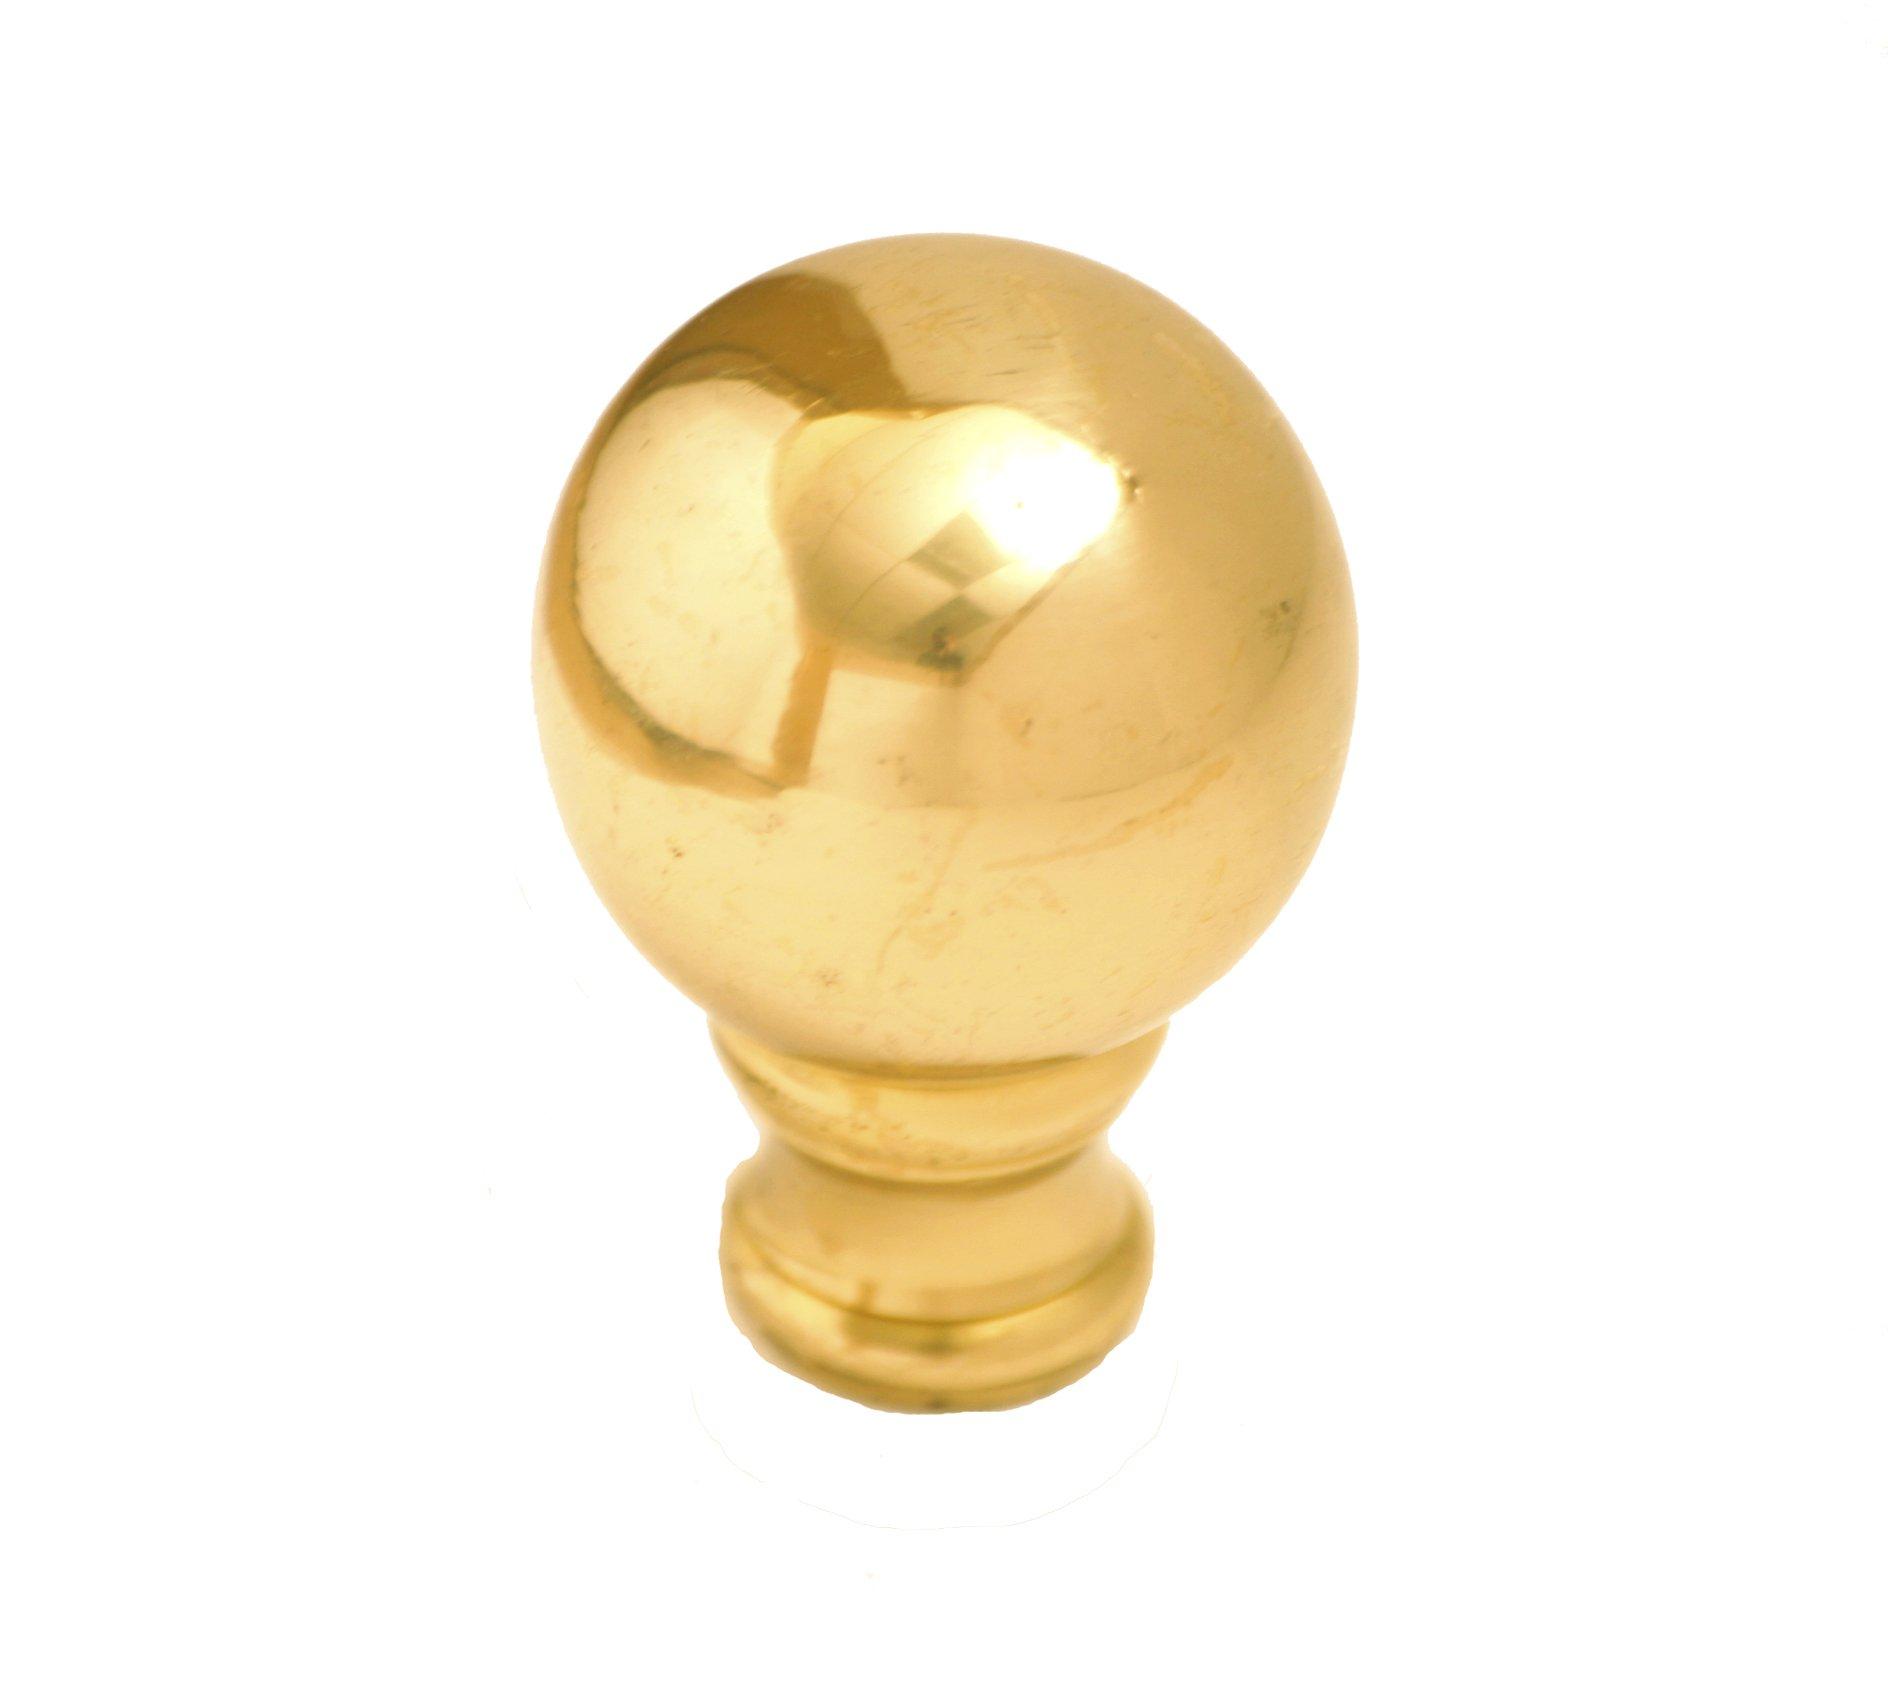 Royal Designs Medium Ball Lamp Finial, Polished Brass (F-106PB)